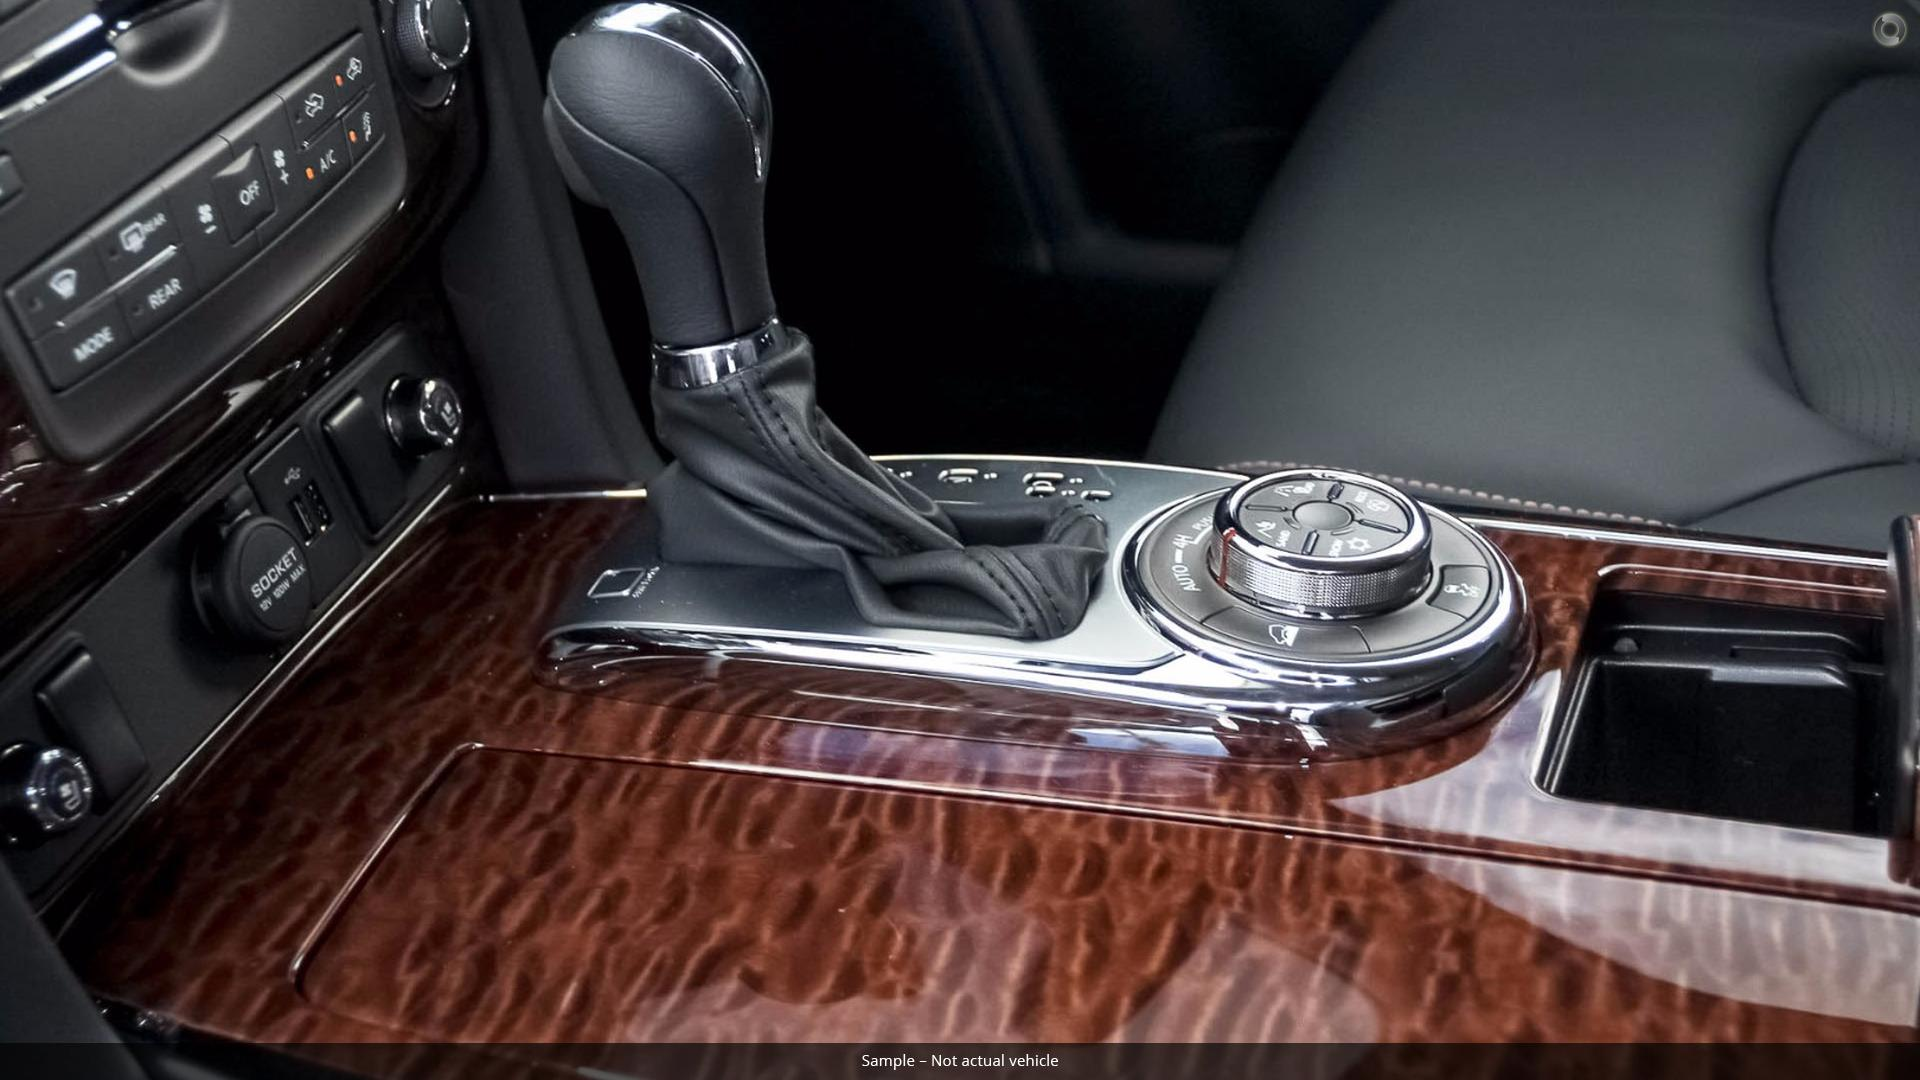 2018 Nissan Patrol Ti-L Y62 Series 4